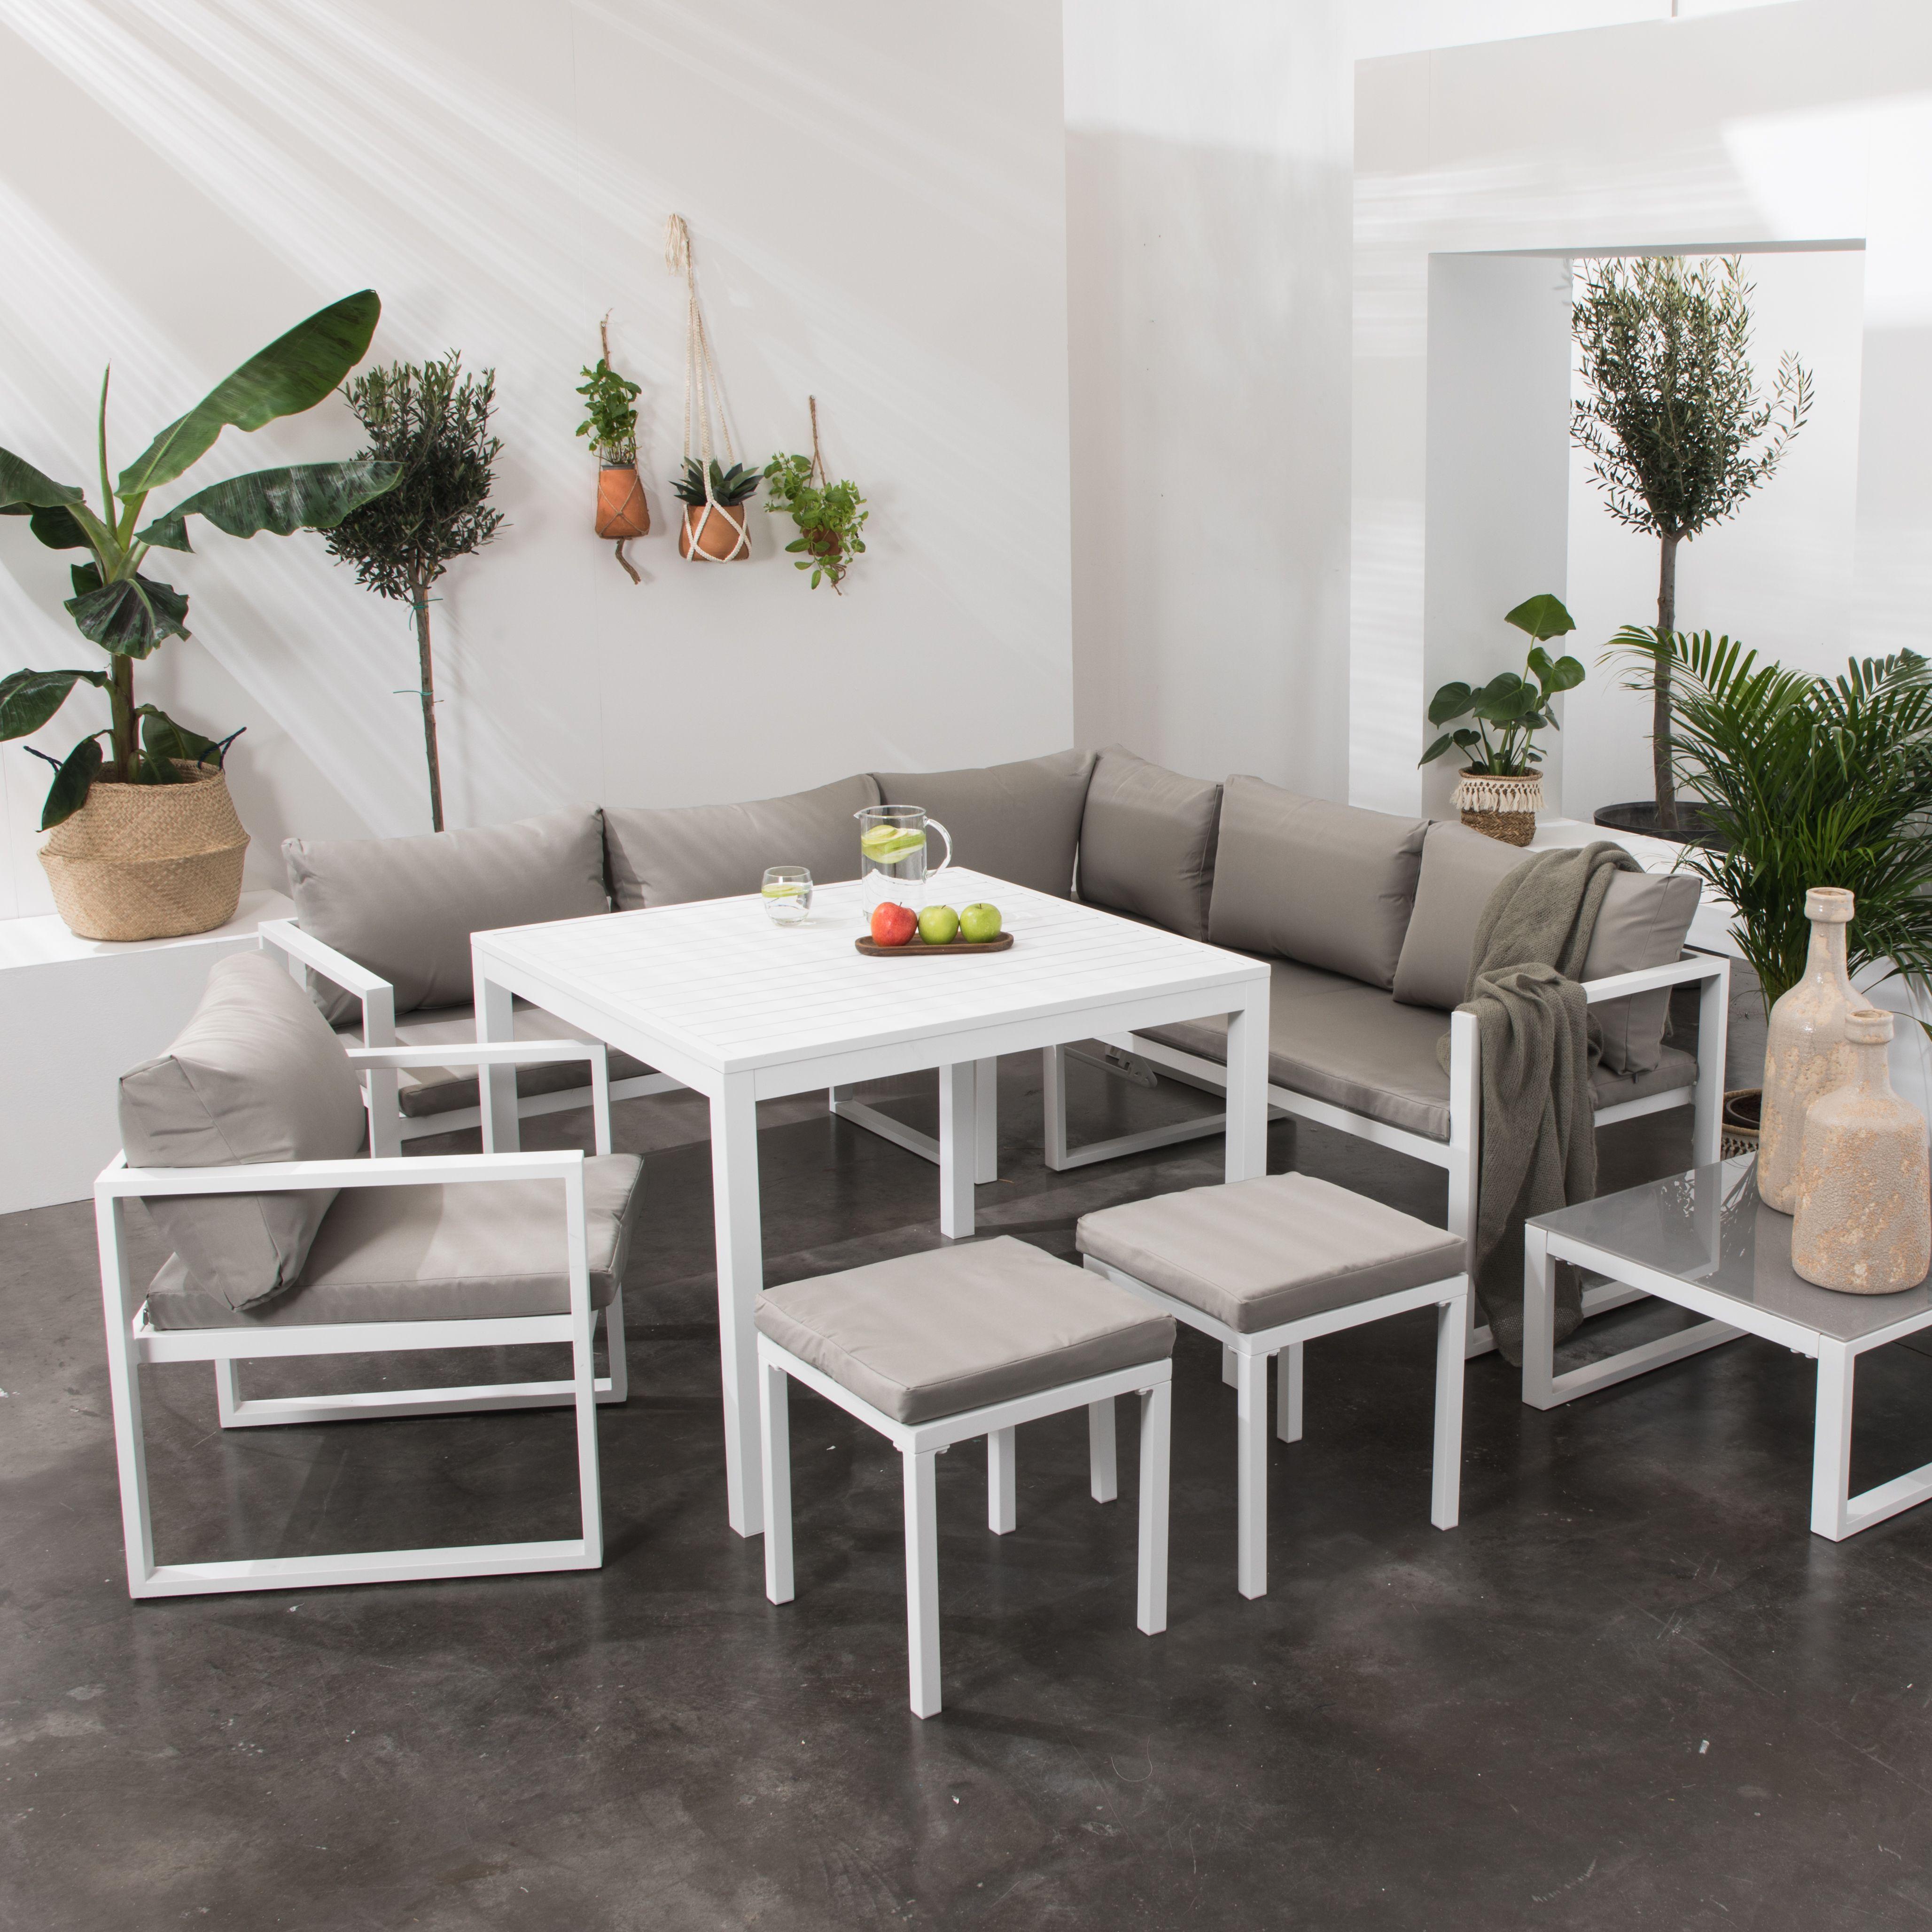 salons de jardin ibiza en tissus et aluminium 7 places salon de jardin meuble terrasse canape angle